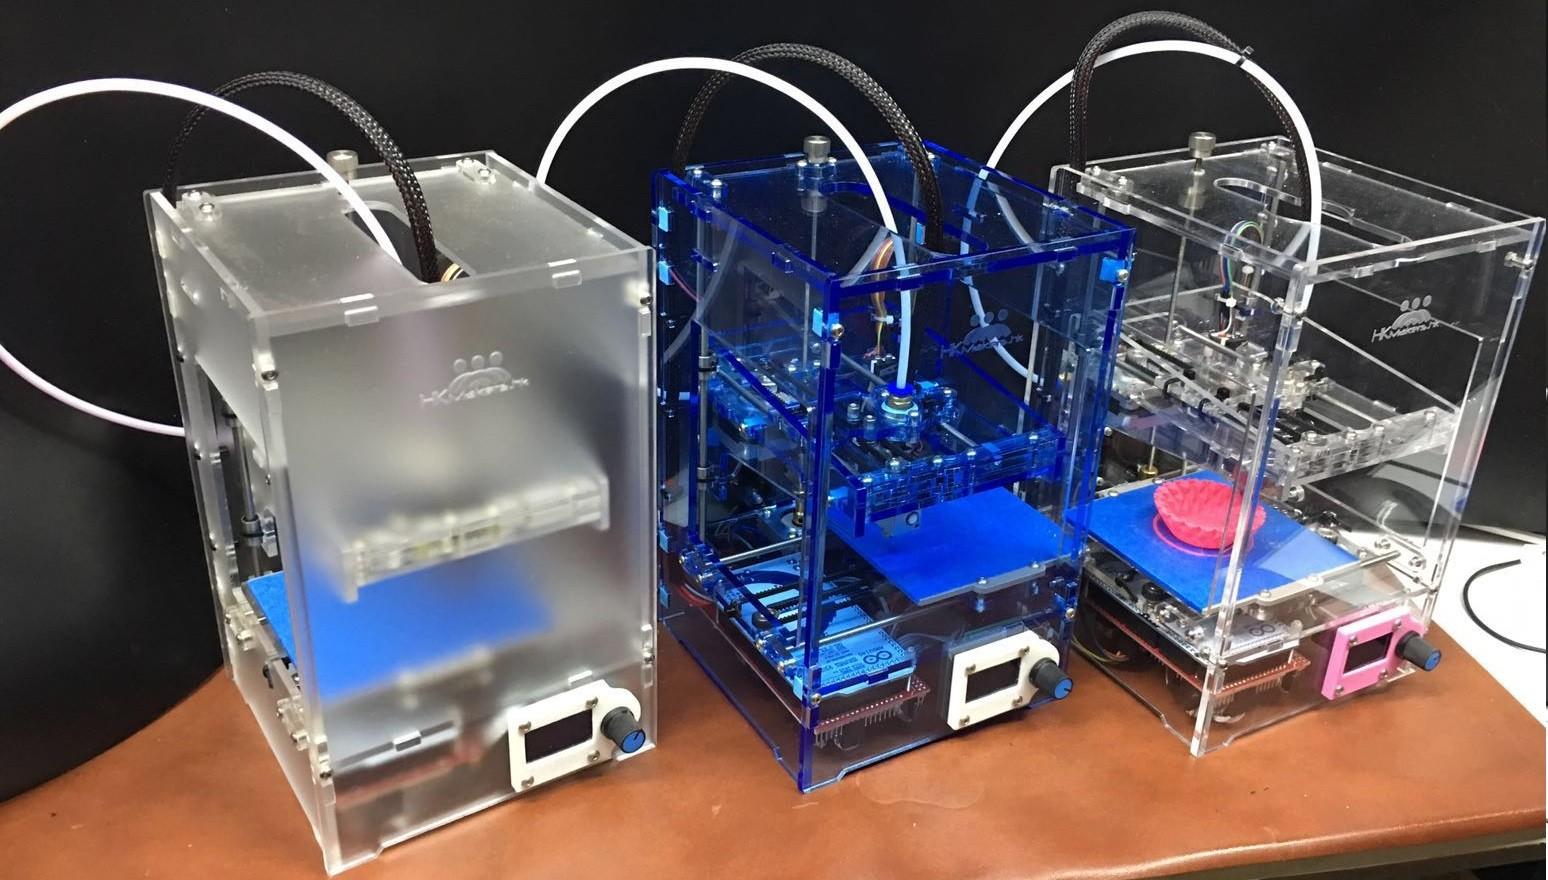 Tinyboy E8 3D Printer